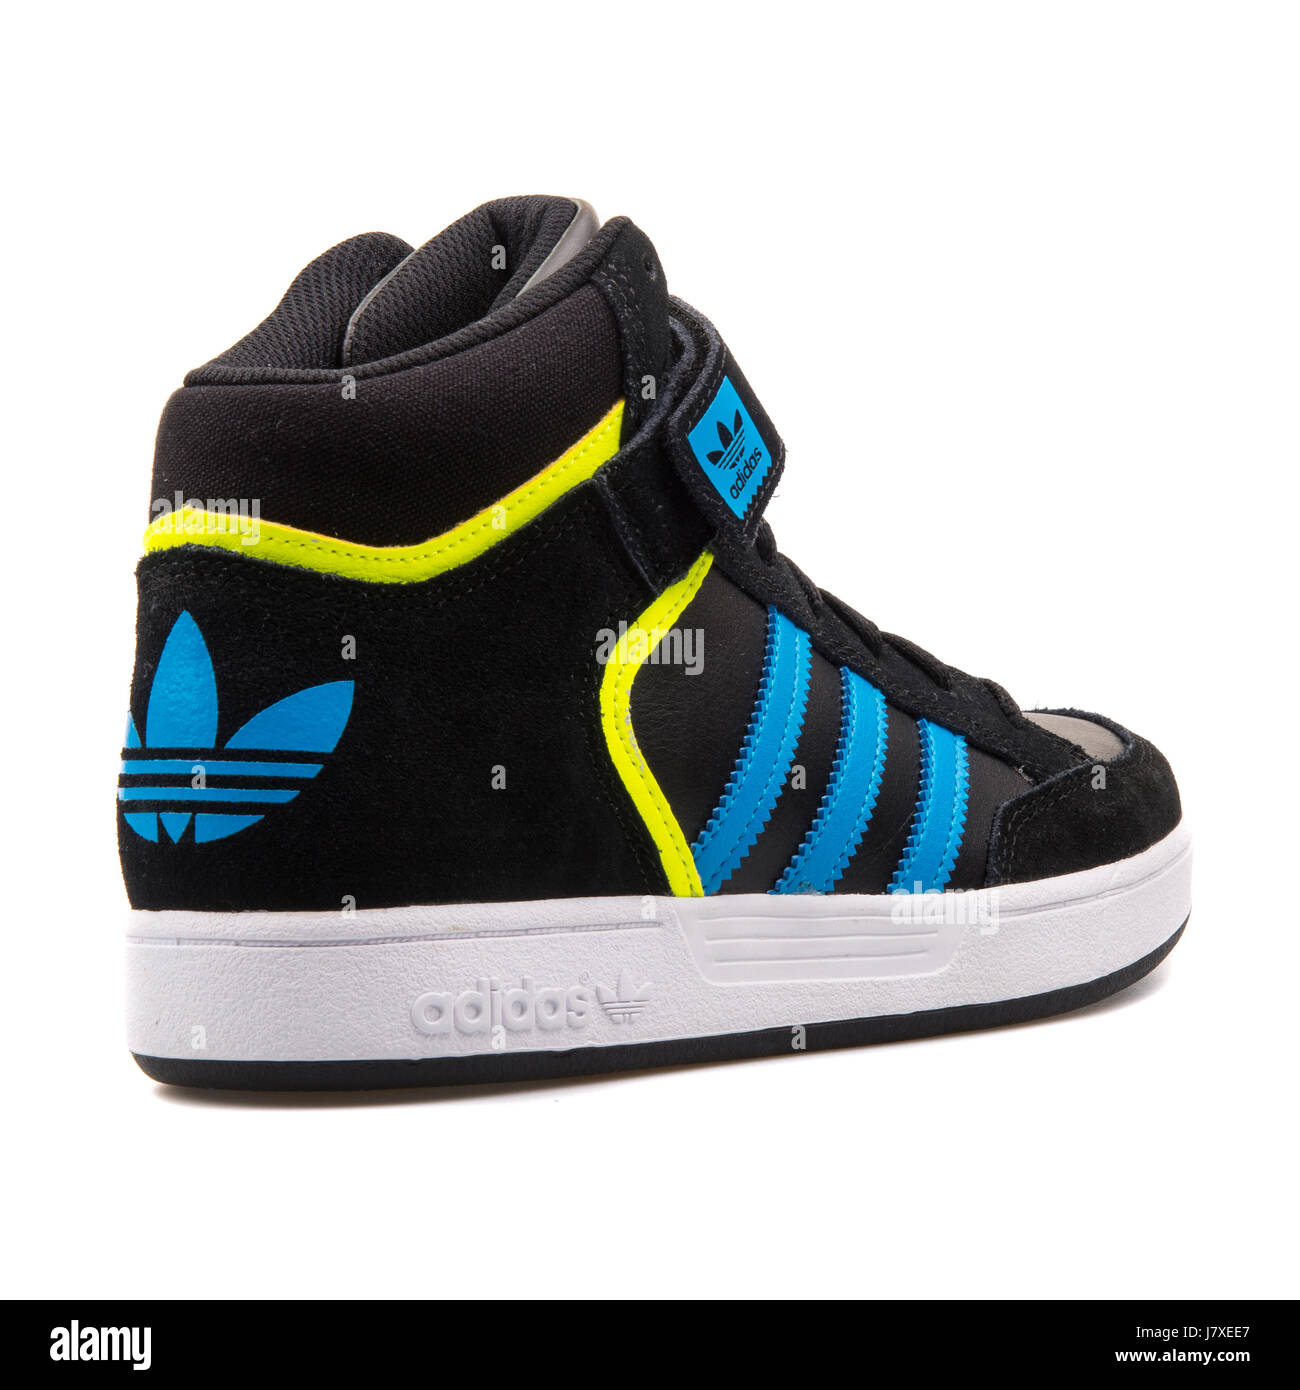 Adidas Varial Mid Sneaker für Kinder